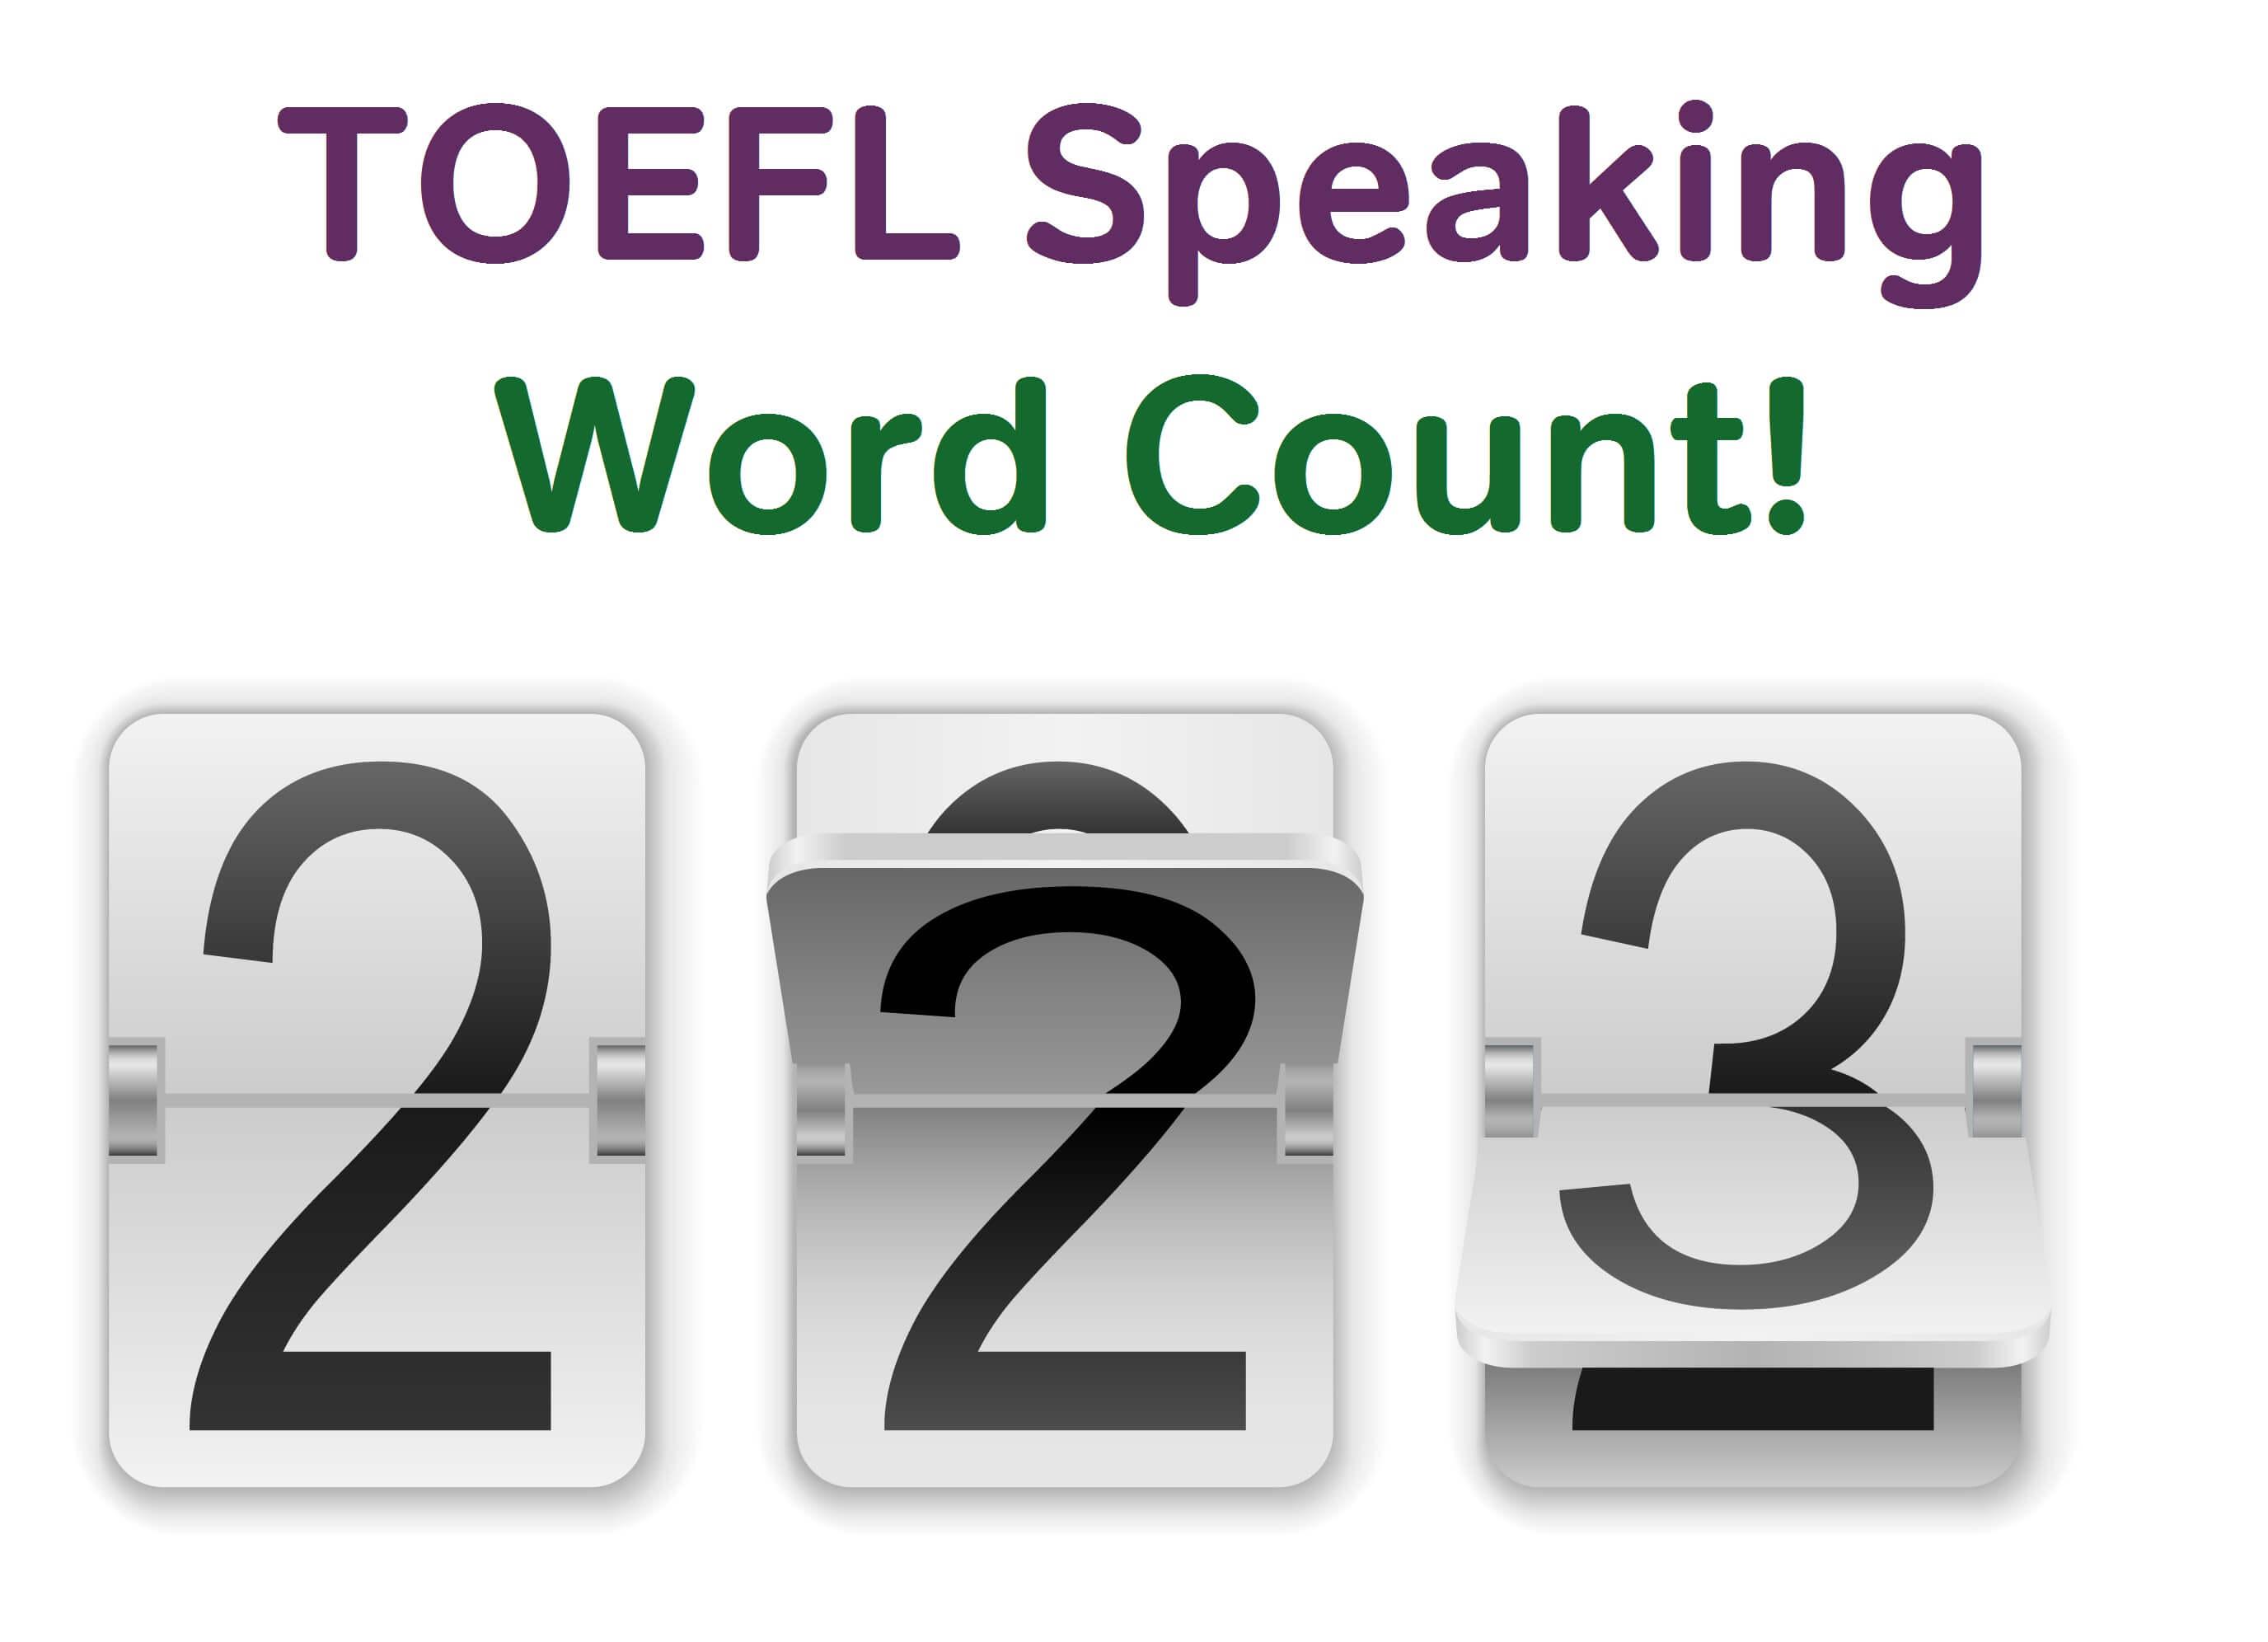 Toefl Speaking Strategy Aim For 100 Words Magoosh Toefl Blog